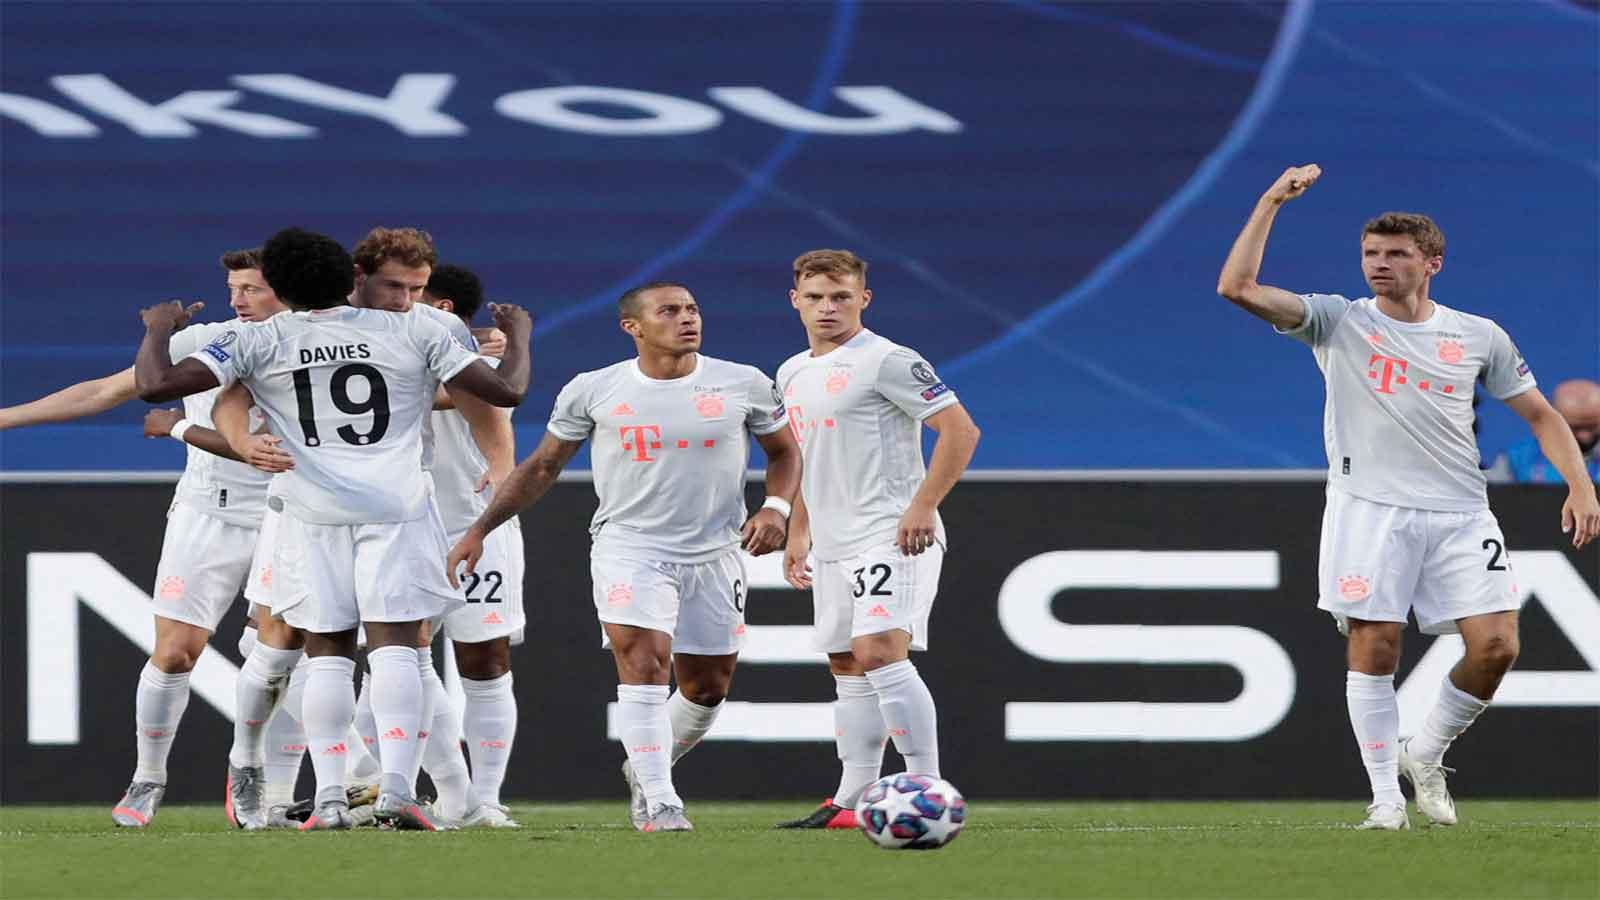 champions-league-bayern-munich-humiliate-hapless-barcelona-with-8-2-crushing